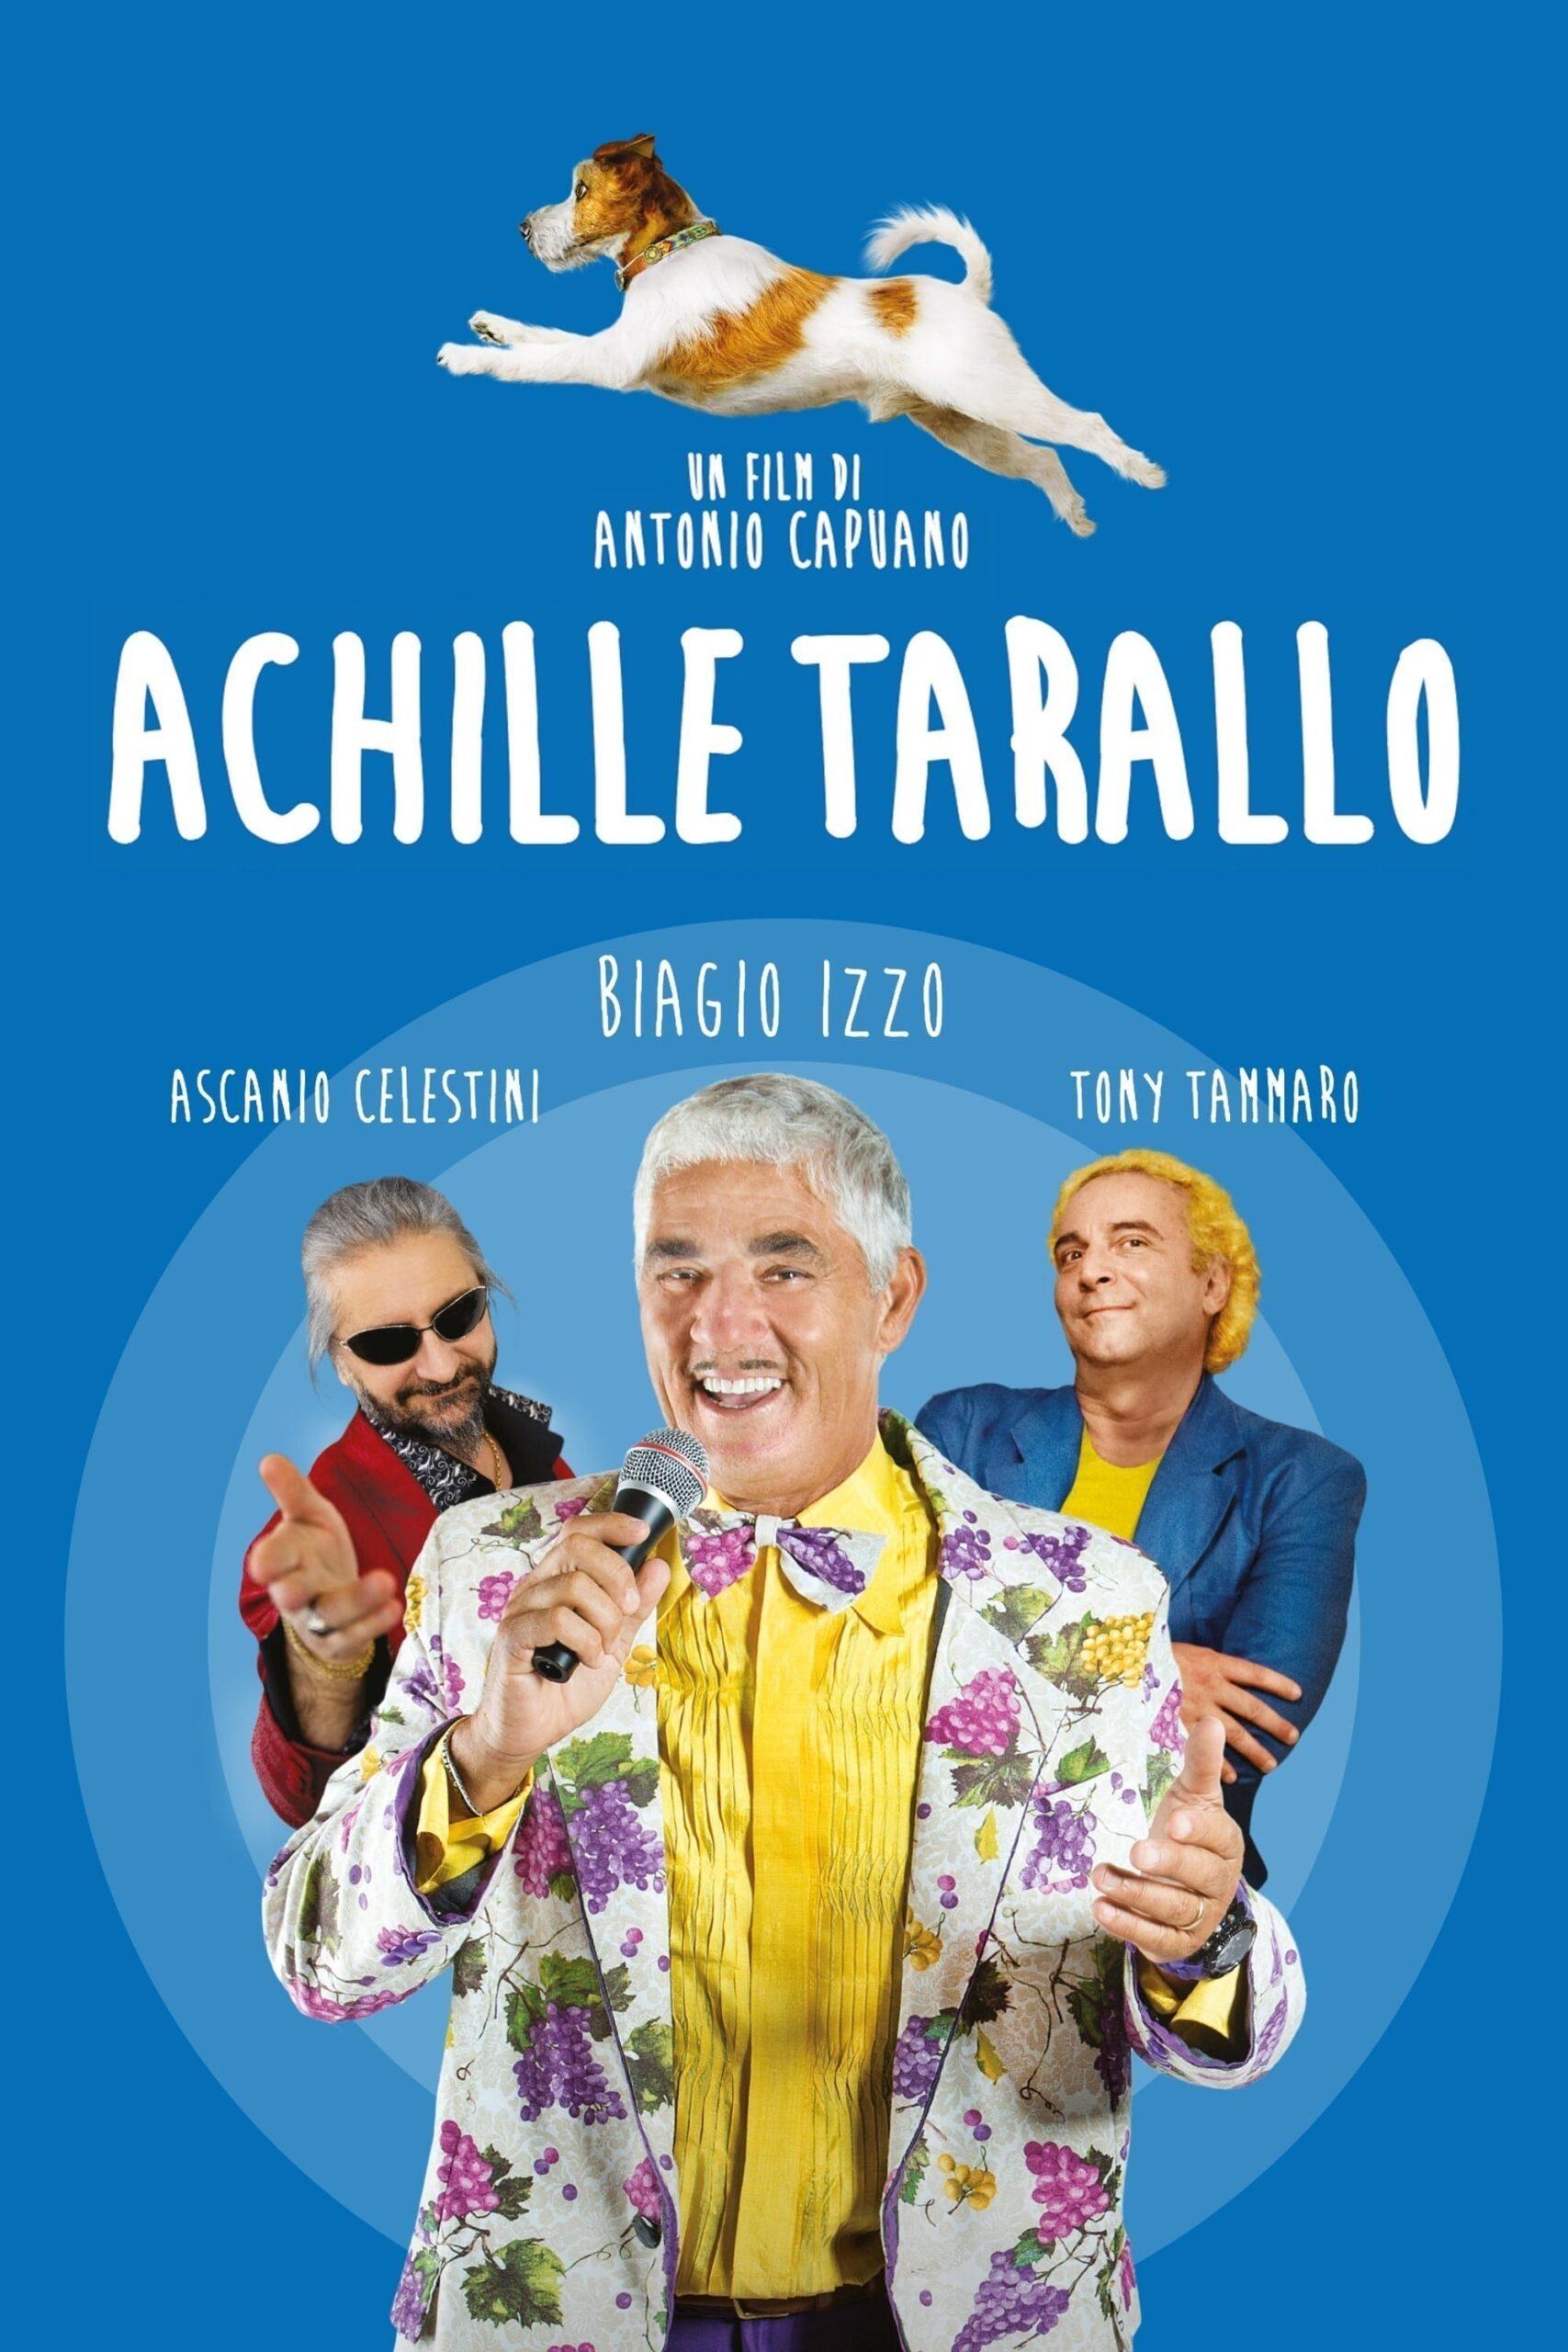 Achille Tarallo Movie Streaming Online